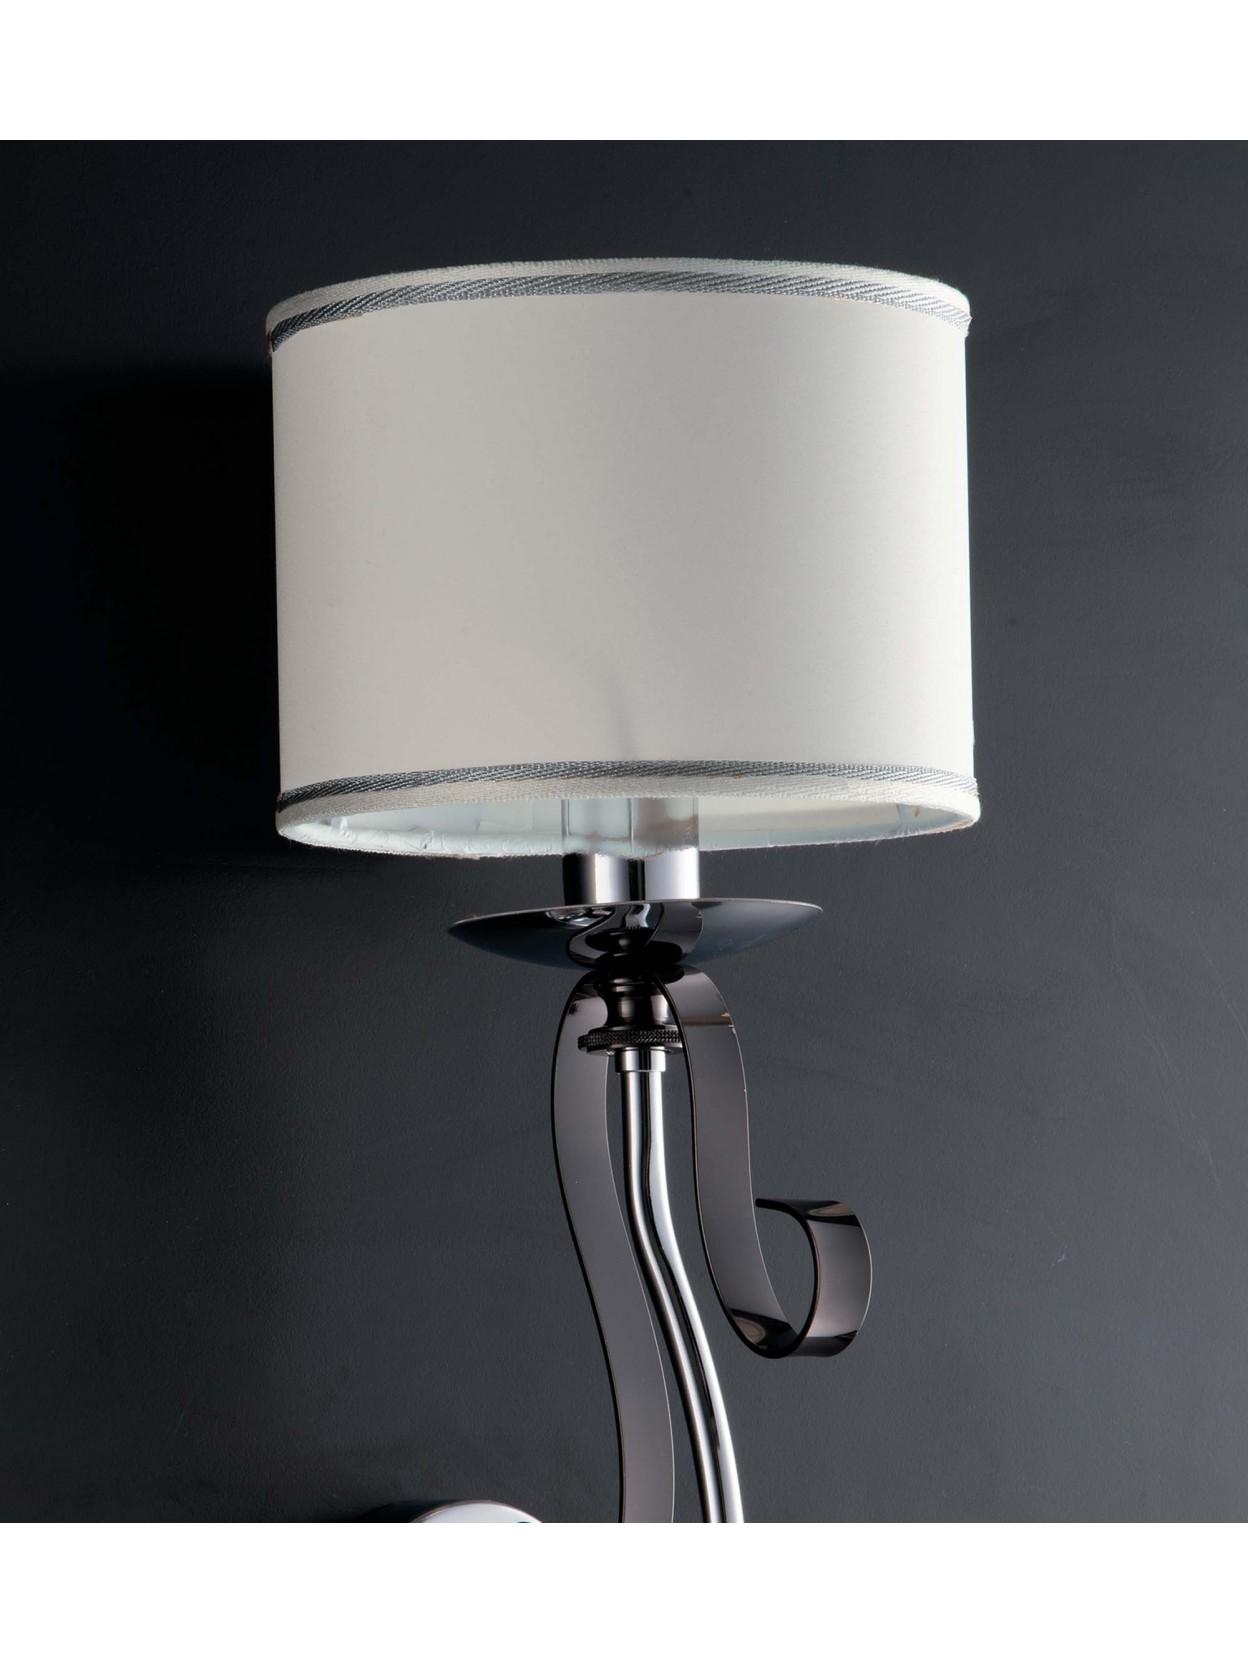 Applique moderno con paralume 1 luce LGT Mina nero e cromato